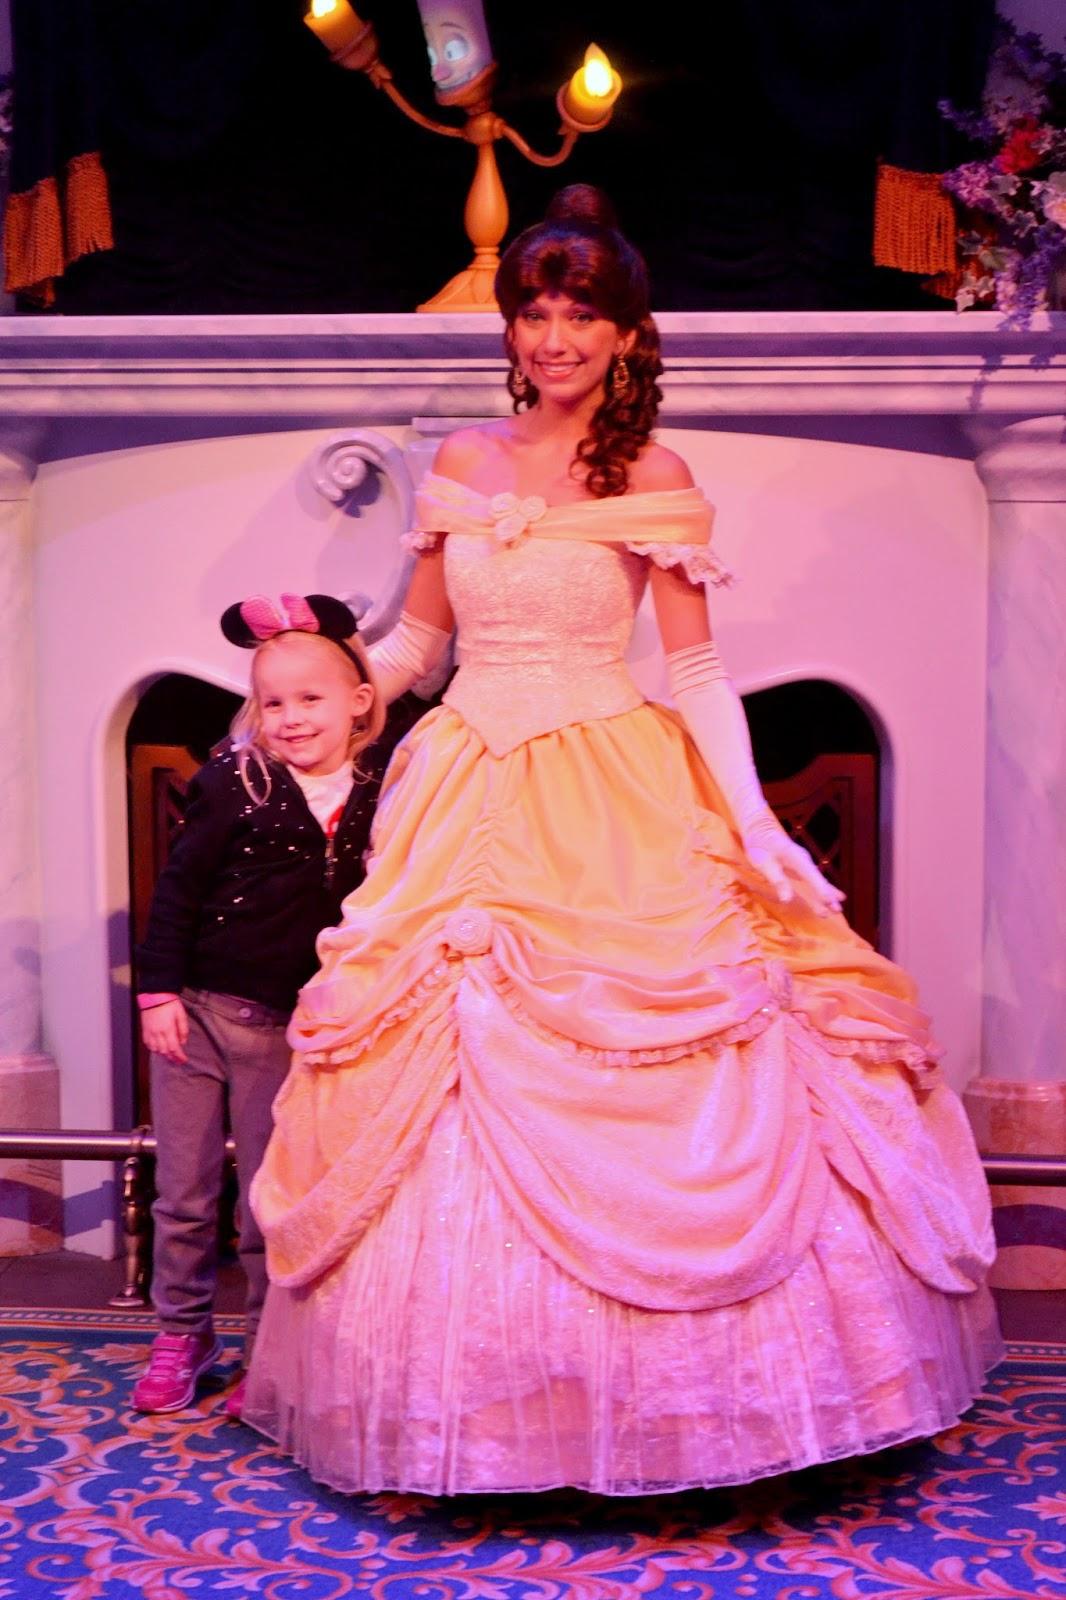 Disney's Magic Kingdom Meeting Belle